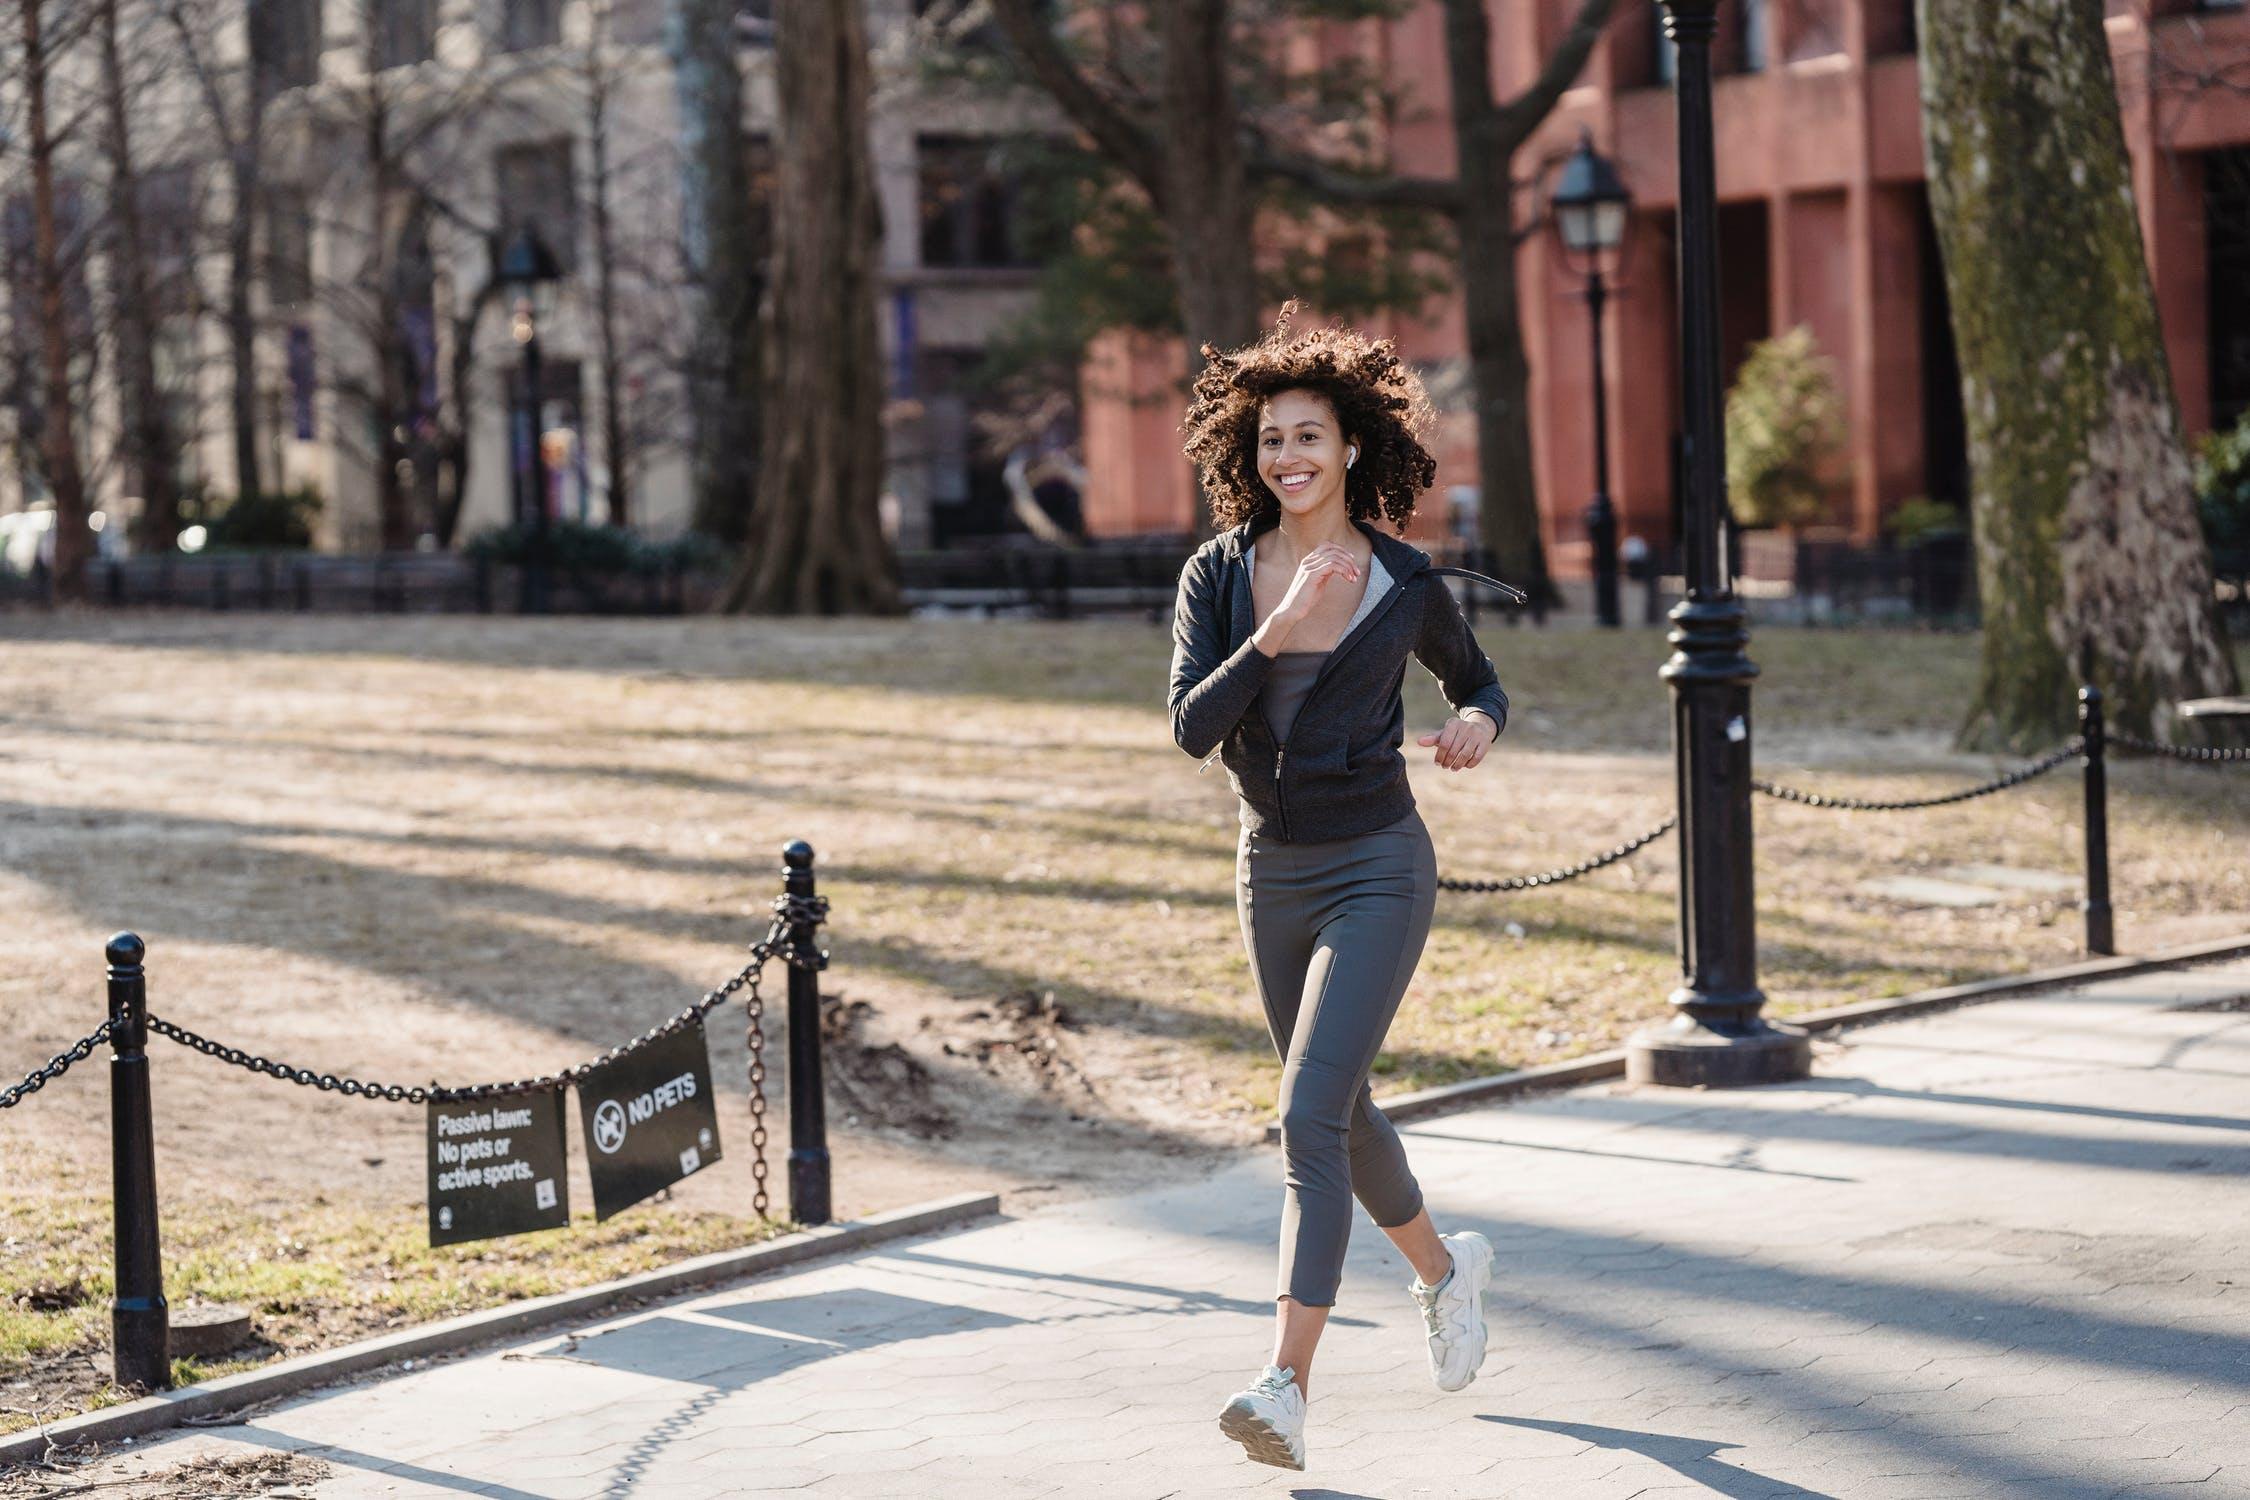 Black sportswoman jogging in park